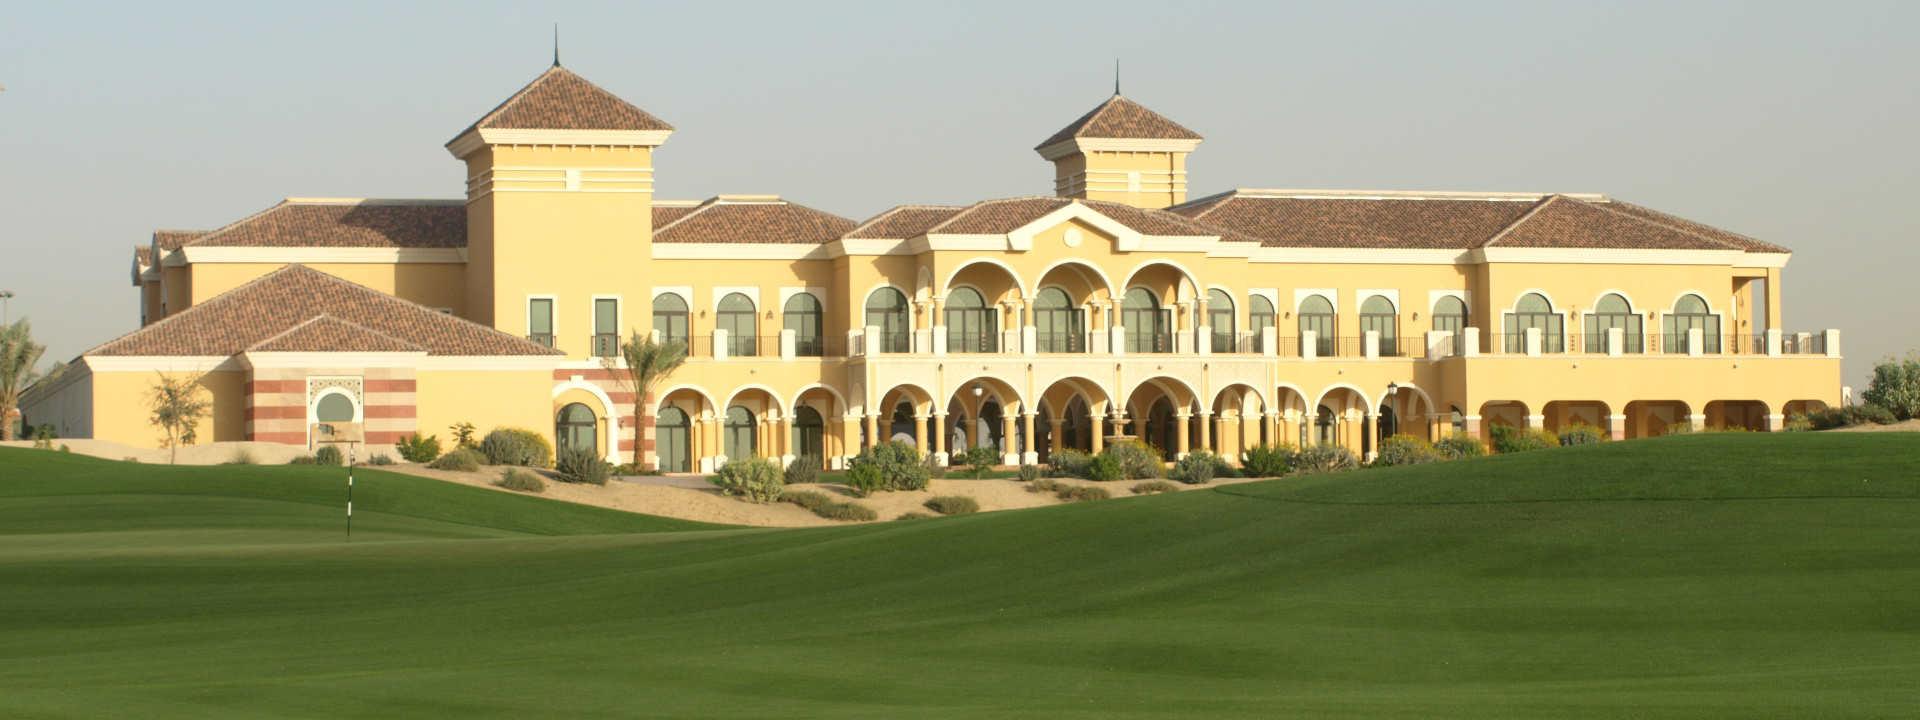 The Els Club Dubai Sports CIty meeting rooms